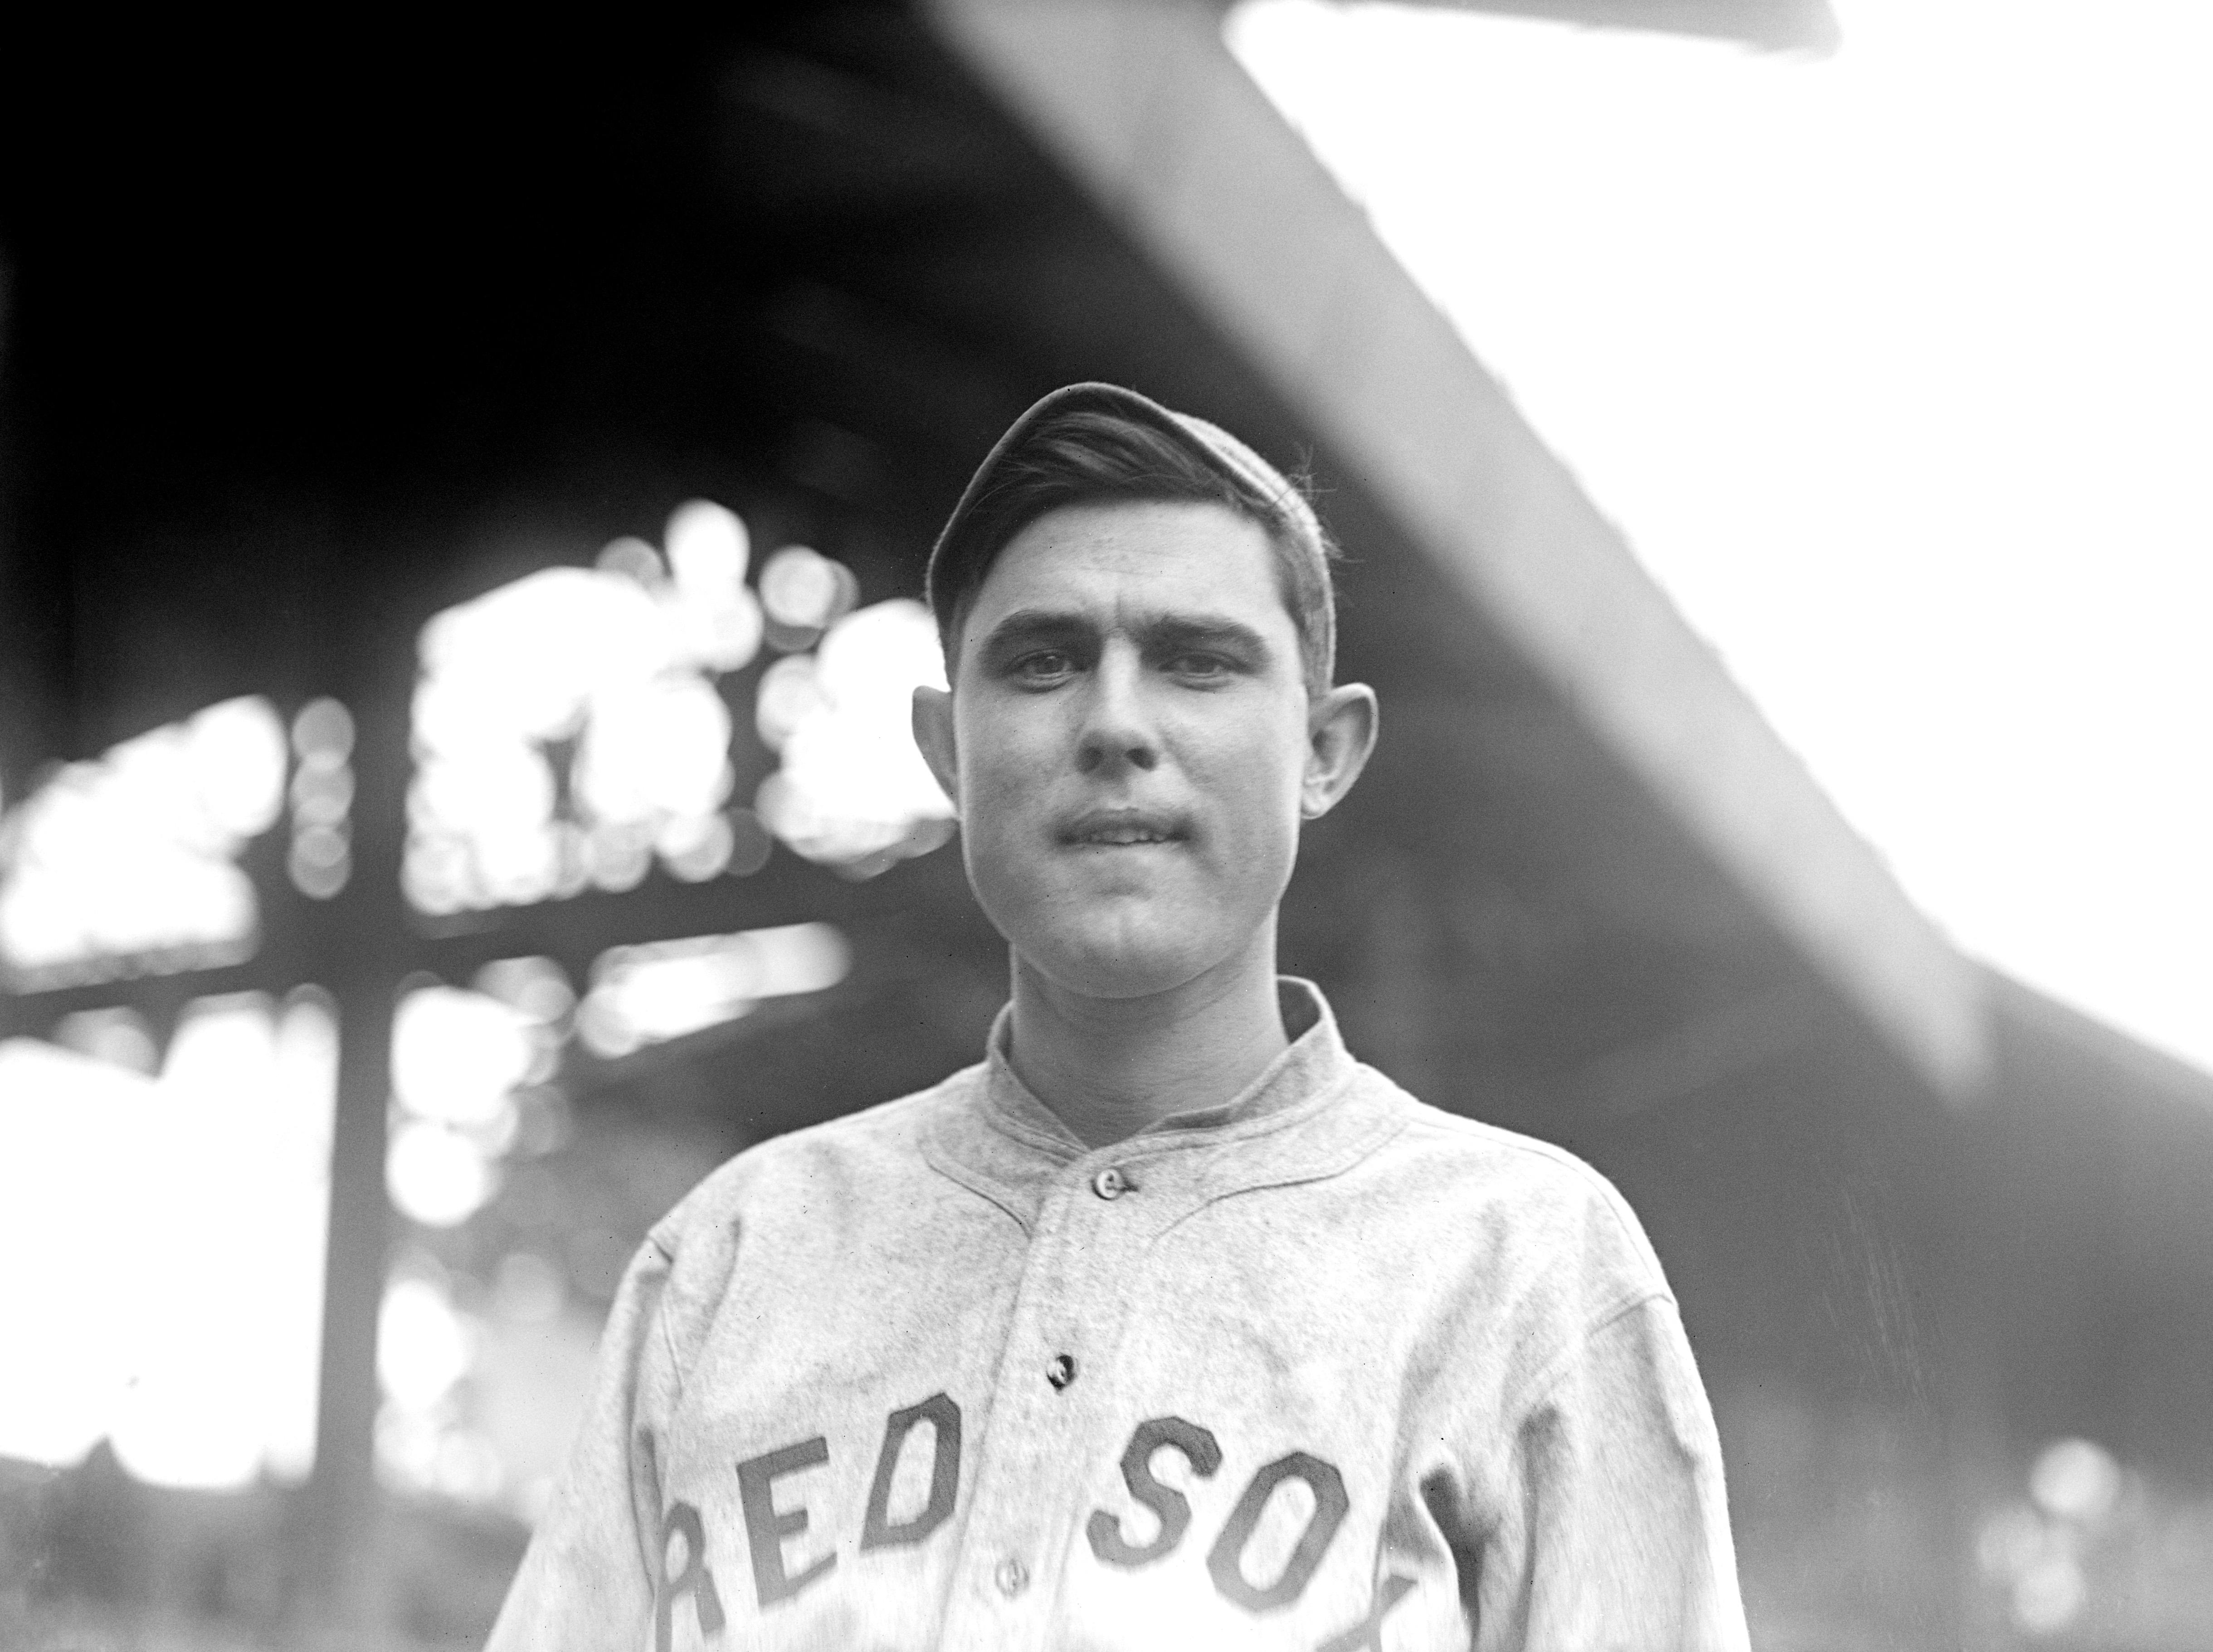 Ernie Shore, Major League Baseball Player, Boston Red Sox, Portrait, circa 1915